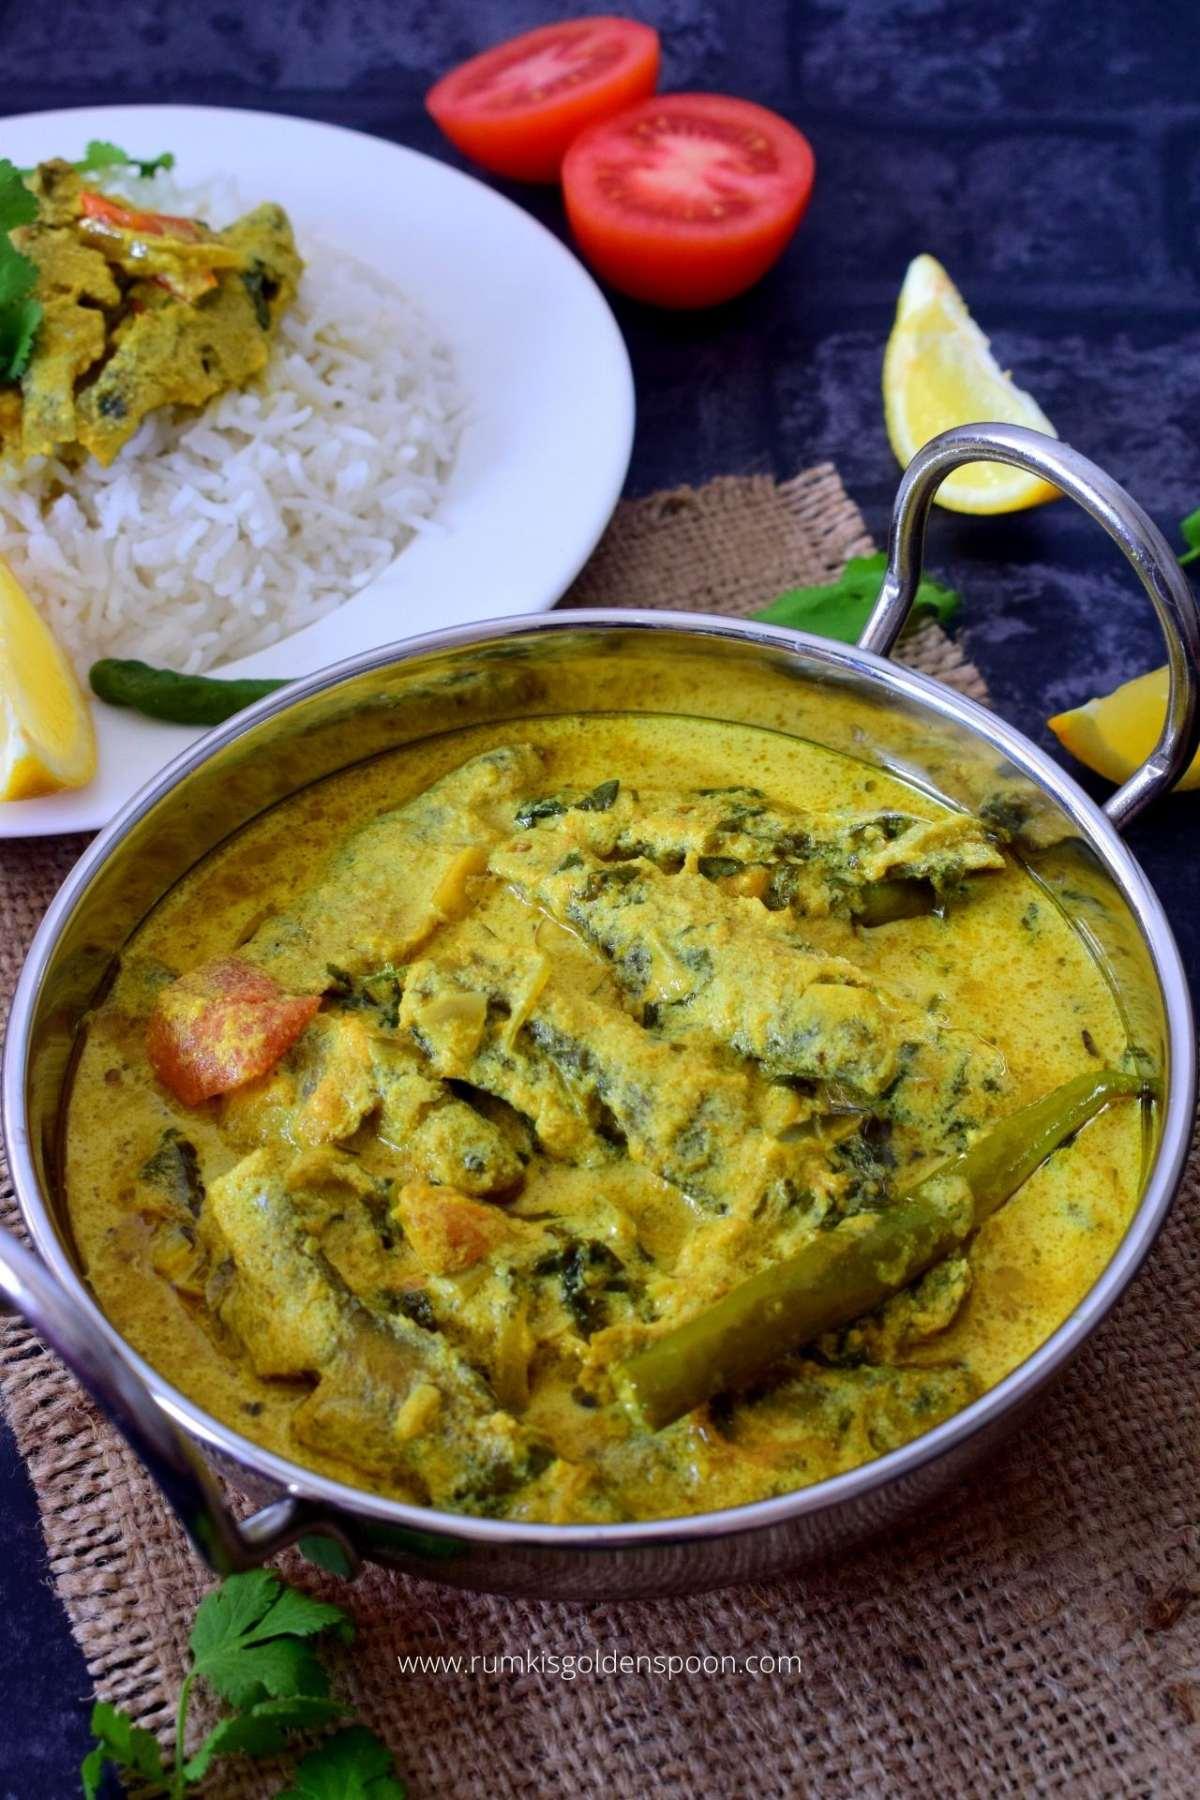 Puti Macher Shorshe Jhal, puti macher shorshe bata, Puti Macher Recipe, puti macher jhol, puti macher jhal, recipe for small fish, choti machli ki gravy, small fish curry, small fish curry recipe, how to make small fish curry, Bengali style fish curry, Bengali style fish curry recipe, recipe for fish curry Bengali style, recipe of fish curry Bengali style, fish curry with mustard paste, bengali fish curry with mustard paste, traditional bengali food, Bengali recipe fish, Bengali recipes fish, recipe for bengali fish curry, Bengali recipe for fish, Bengali recipe of fish, macher jhol, bengali macher jhol, Bengali recipe, Bengali recipes, traditional Bengali food, Rumki's Golden Spoon